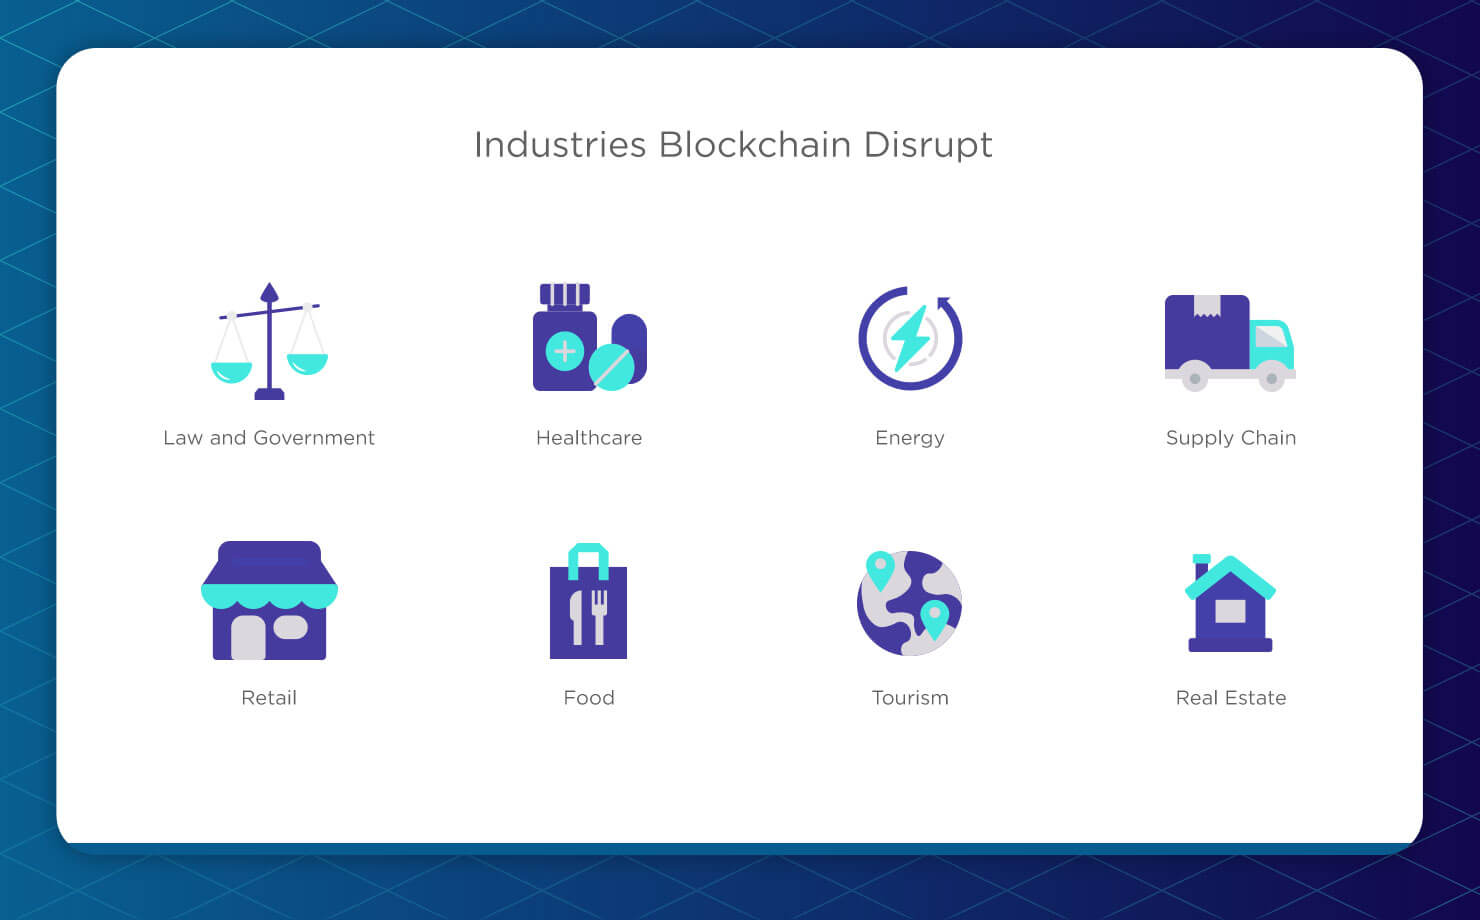 Industries blockchain disrupts